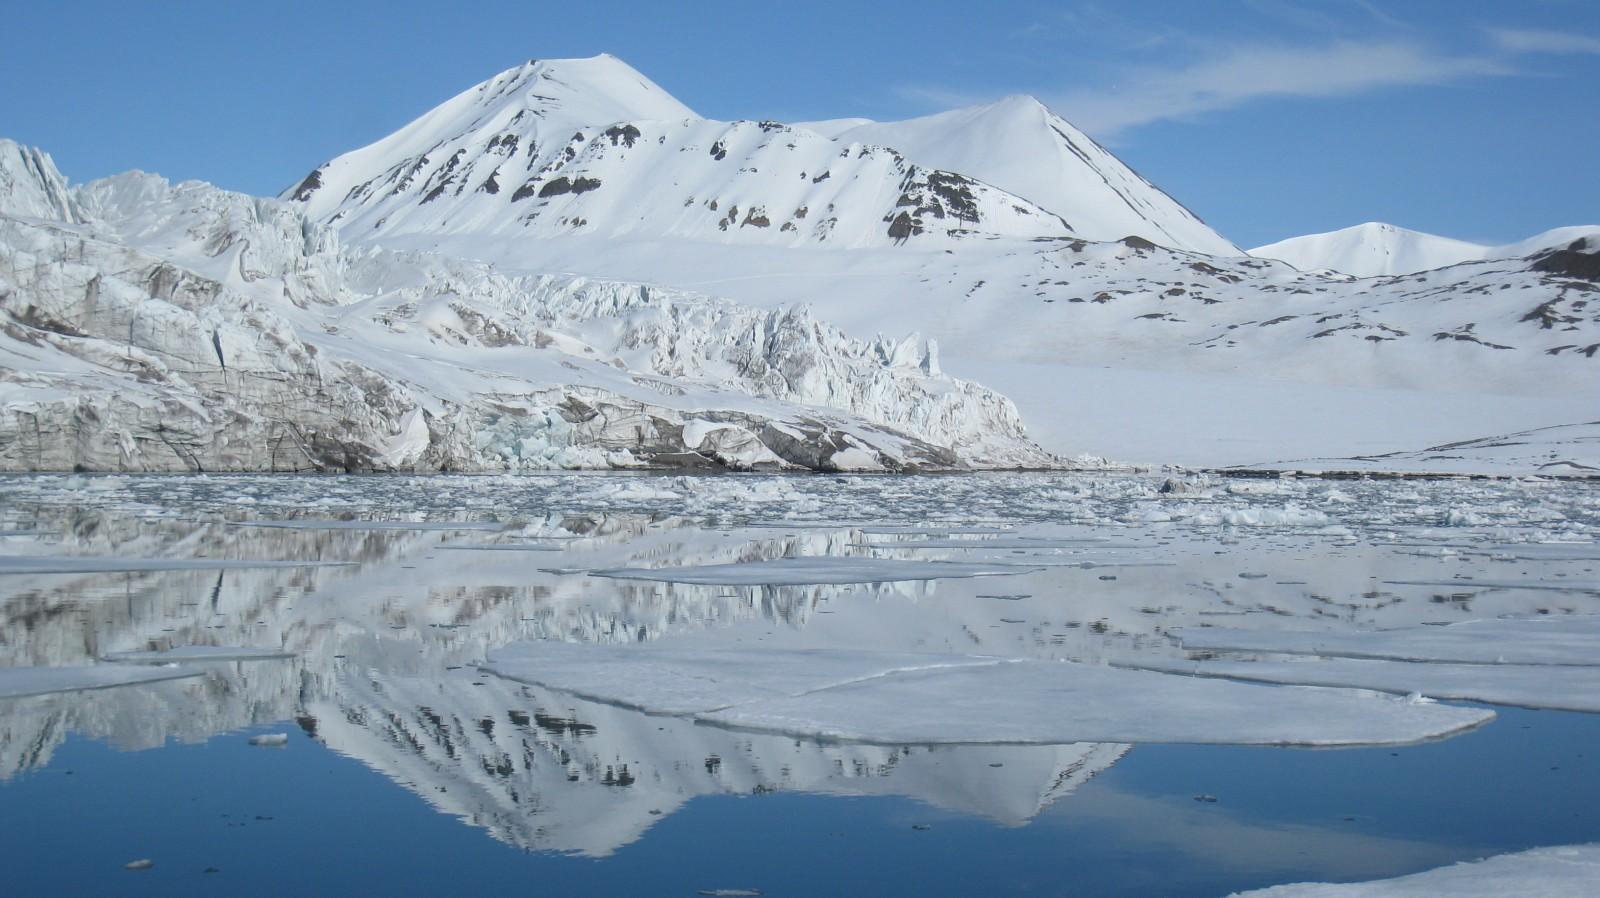 Water reflection in Svalbard. Credit: Fabien Darrouzet (distributed via imaggeo.egu.eu)